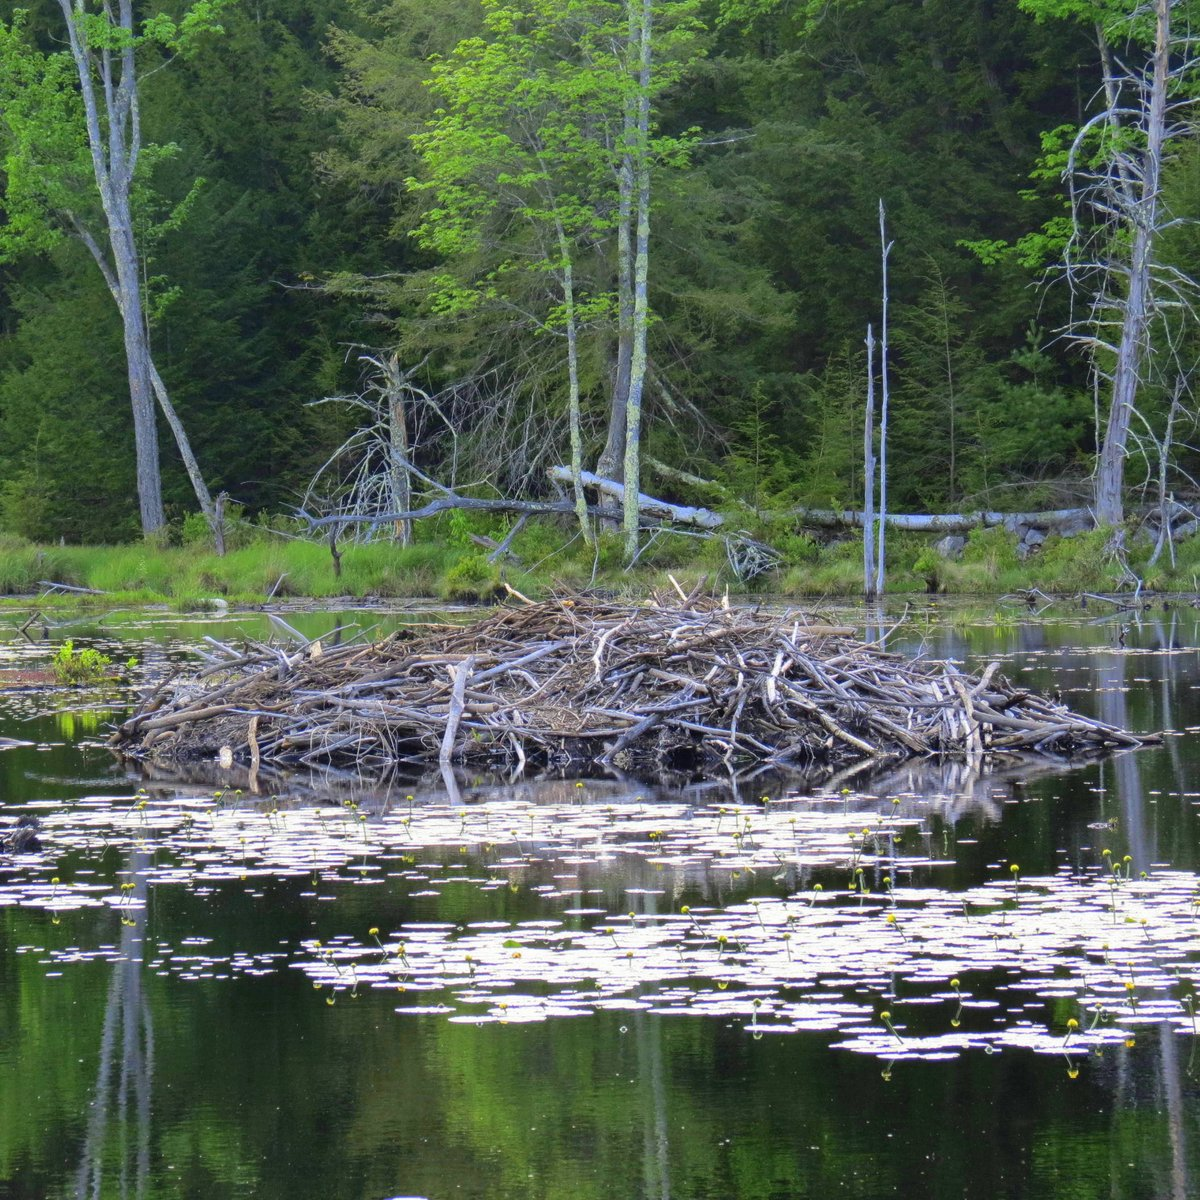 3. Beaver Lodge